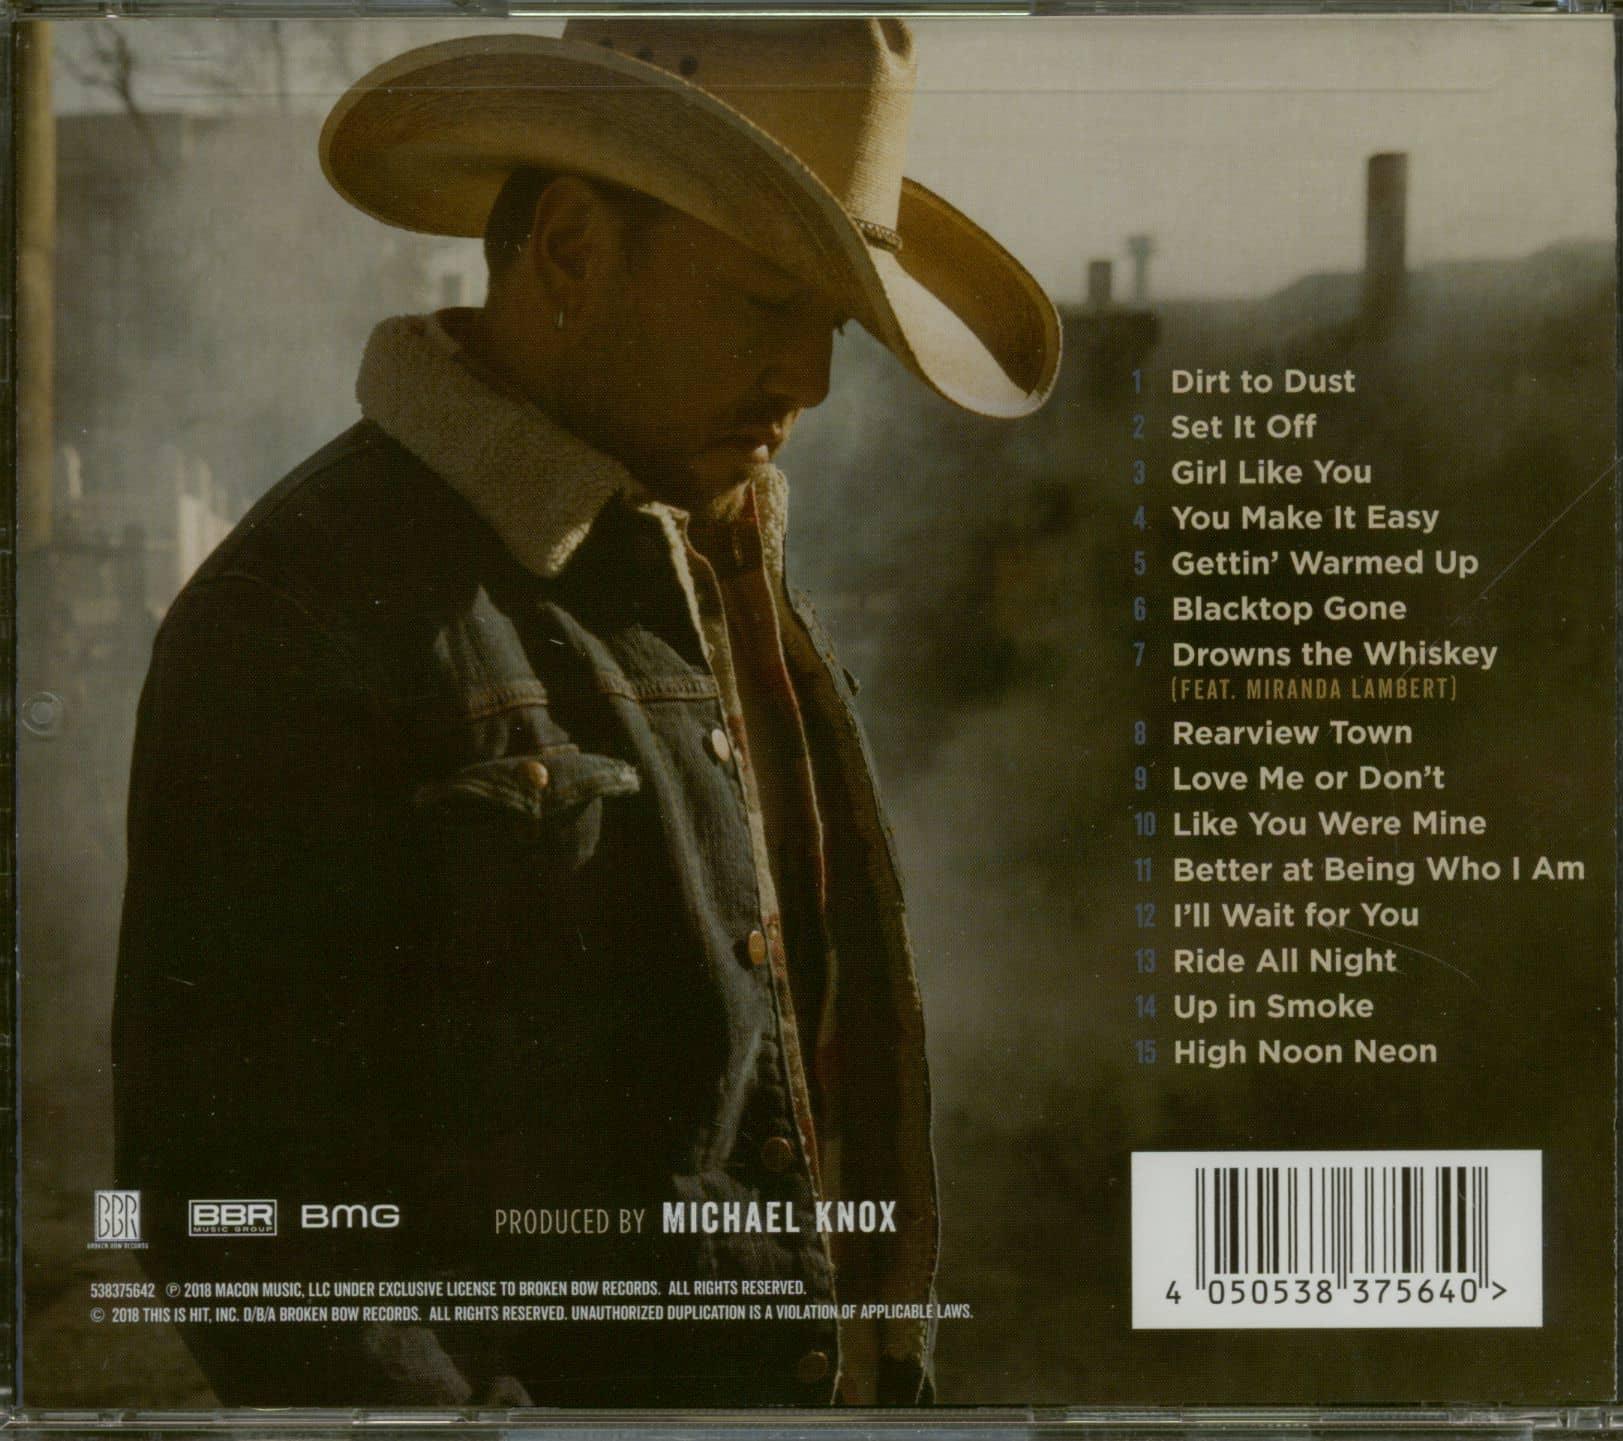 Rearview Town Jason Aldean: Jason Aldean CD: Rearview Town (CD)